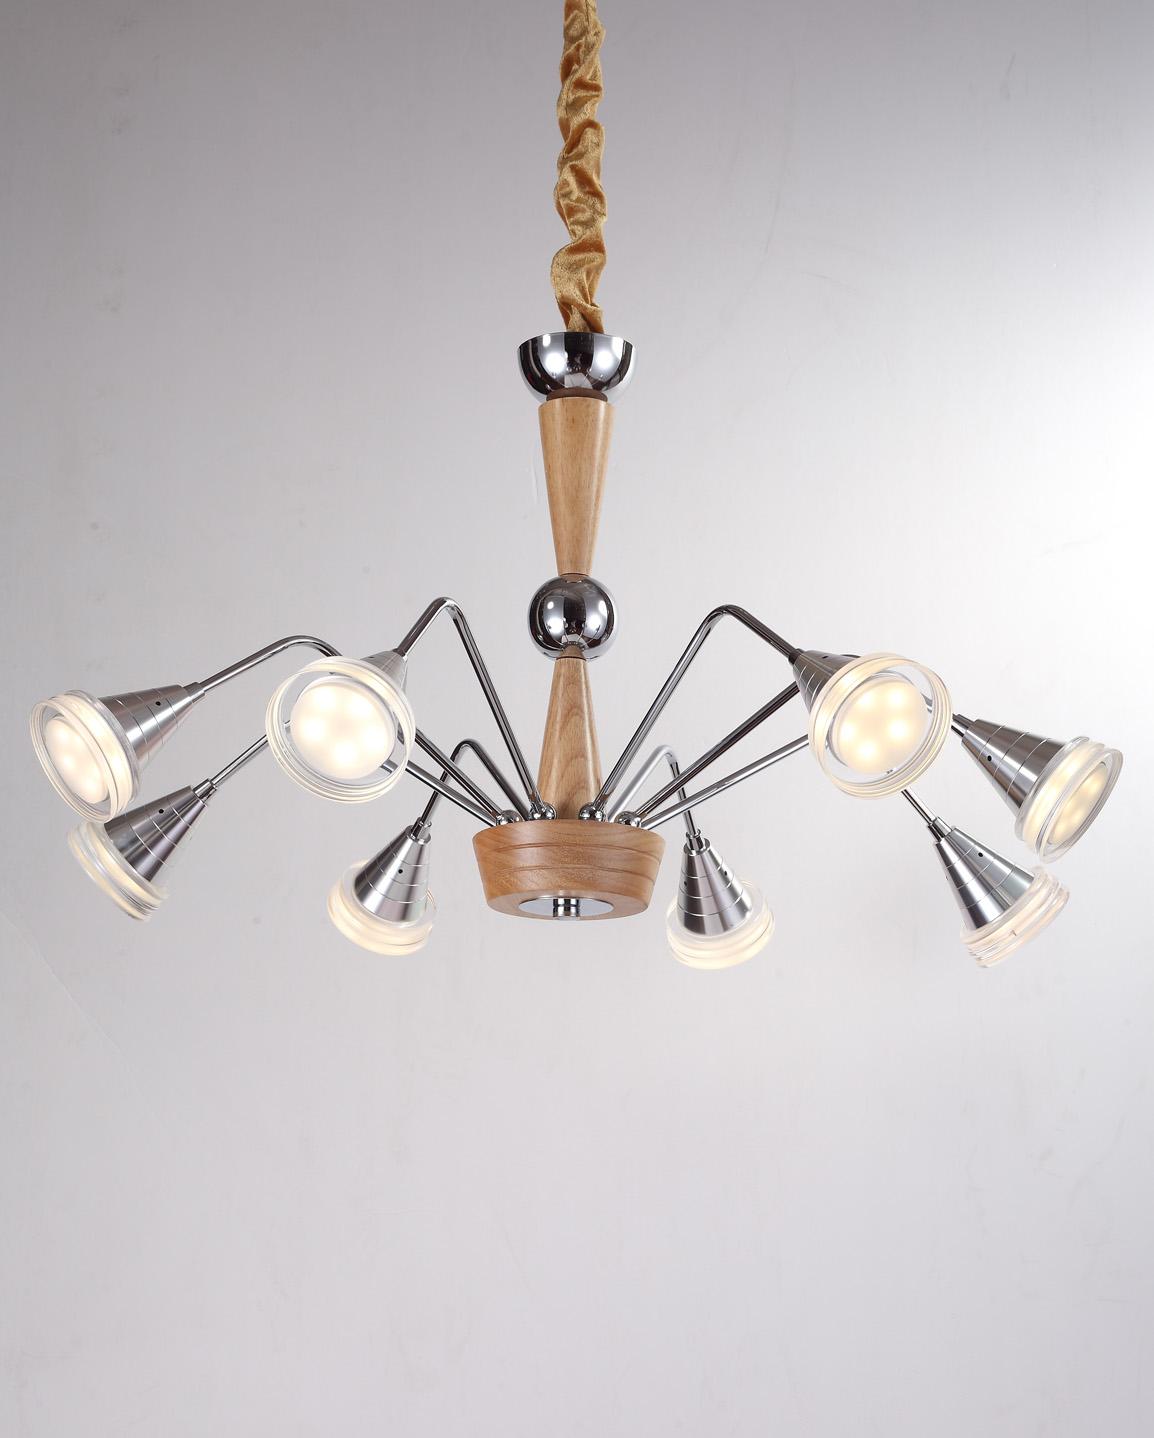 Люстра NaturaЛюстры подвесные<br>&amp;lt;div&amp;gt;Вид цоколя: LED&amp;lt;/div&amp;gt;&amp;lt;div&amp;gt;Мощность: &amp;amp;nbsp;5W&amp;amp;nbsp;&amp;lt;/div&amp;gt;&amp;lt;div&amp;gt;Количество ламп: 8&amp;lt;/div&amp;gt;<br><br>Material: Дерево<br>Height см: 79<br>Diameter см: 68